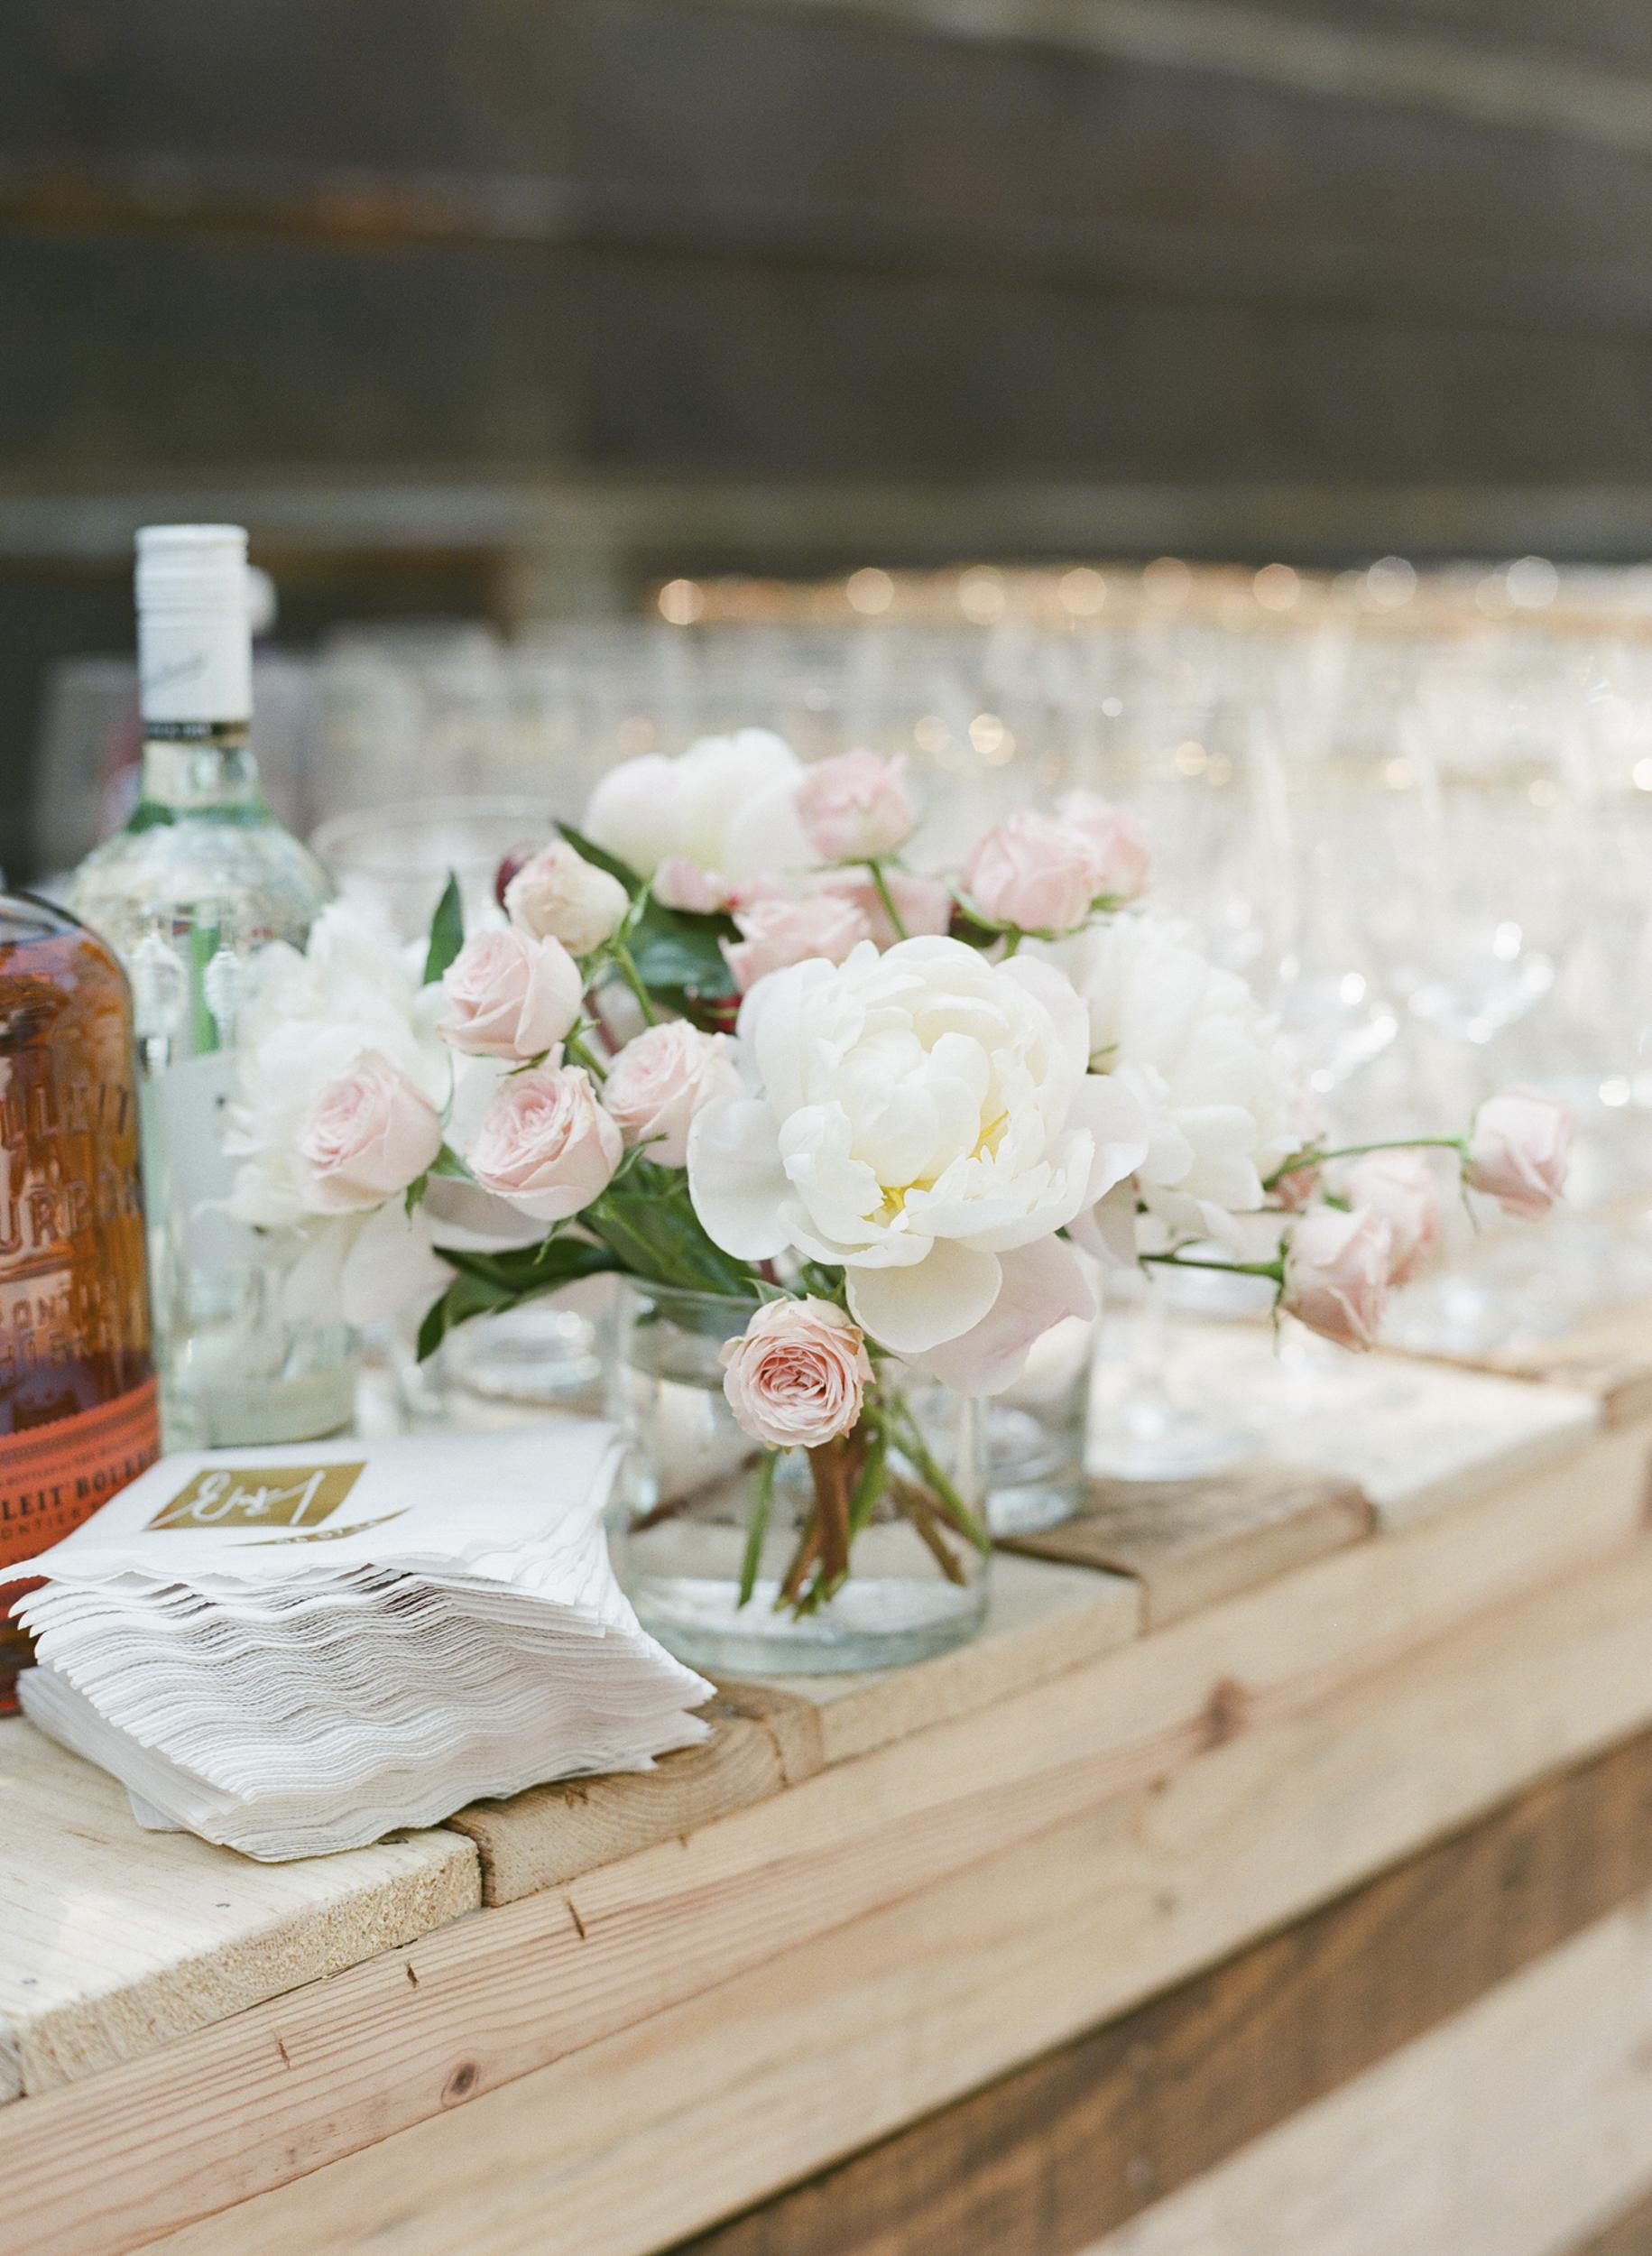 south_carolina_farm_wedding_rustic_chic_surprise_secret_luxe_wedding_bachelorette_emily_maynard_real_weddings-12.jpg